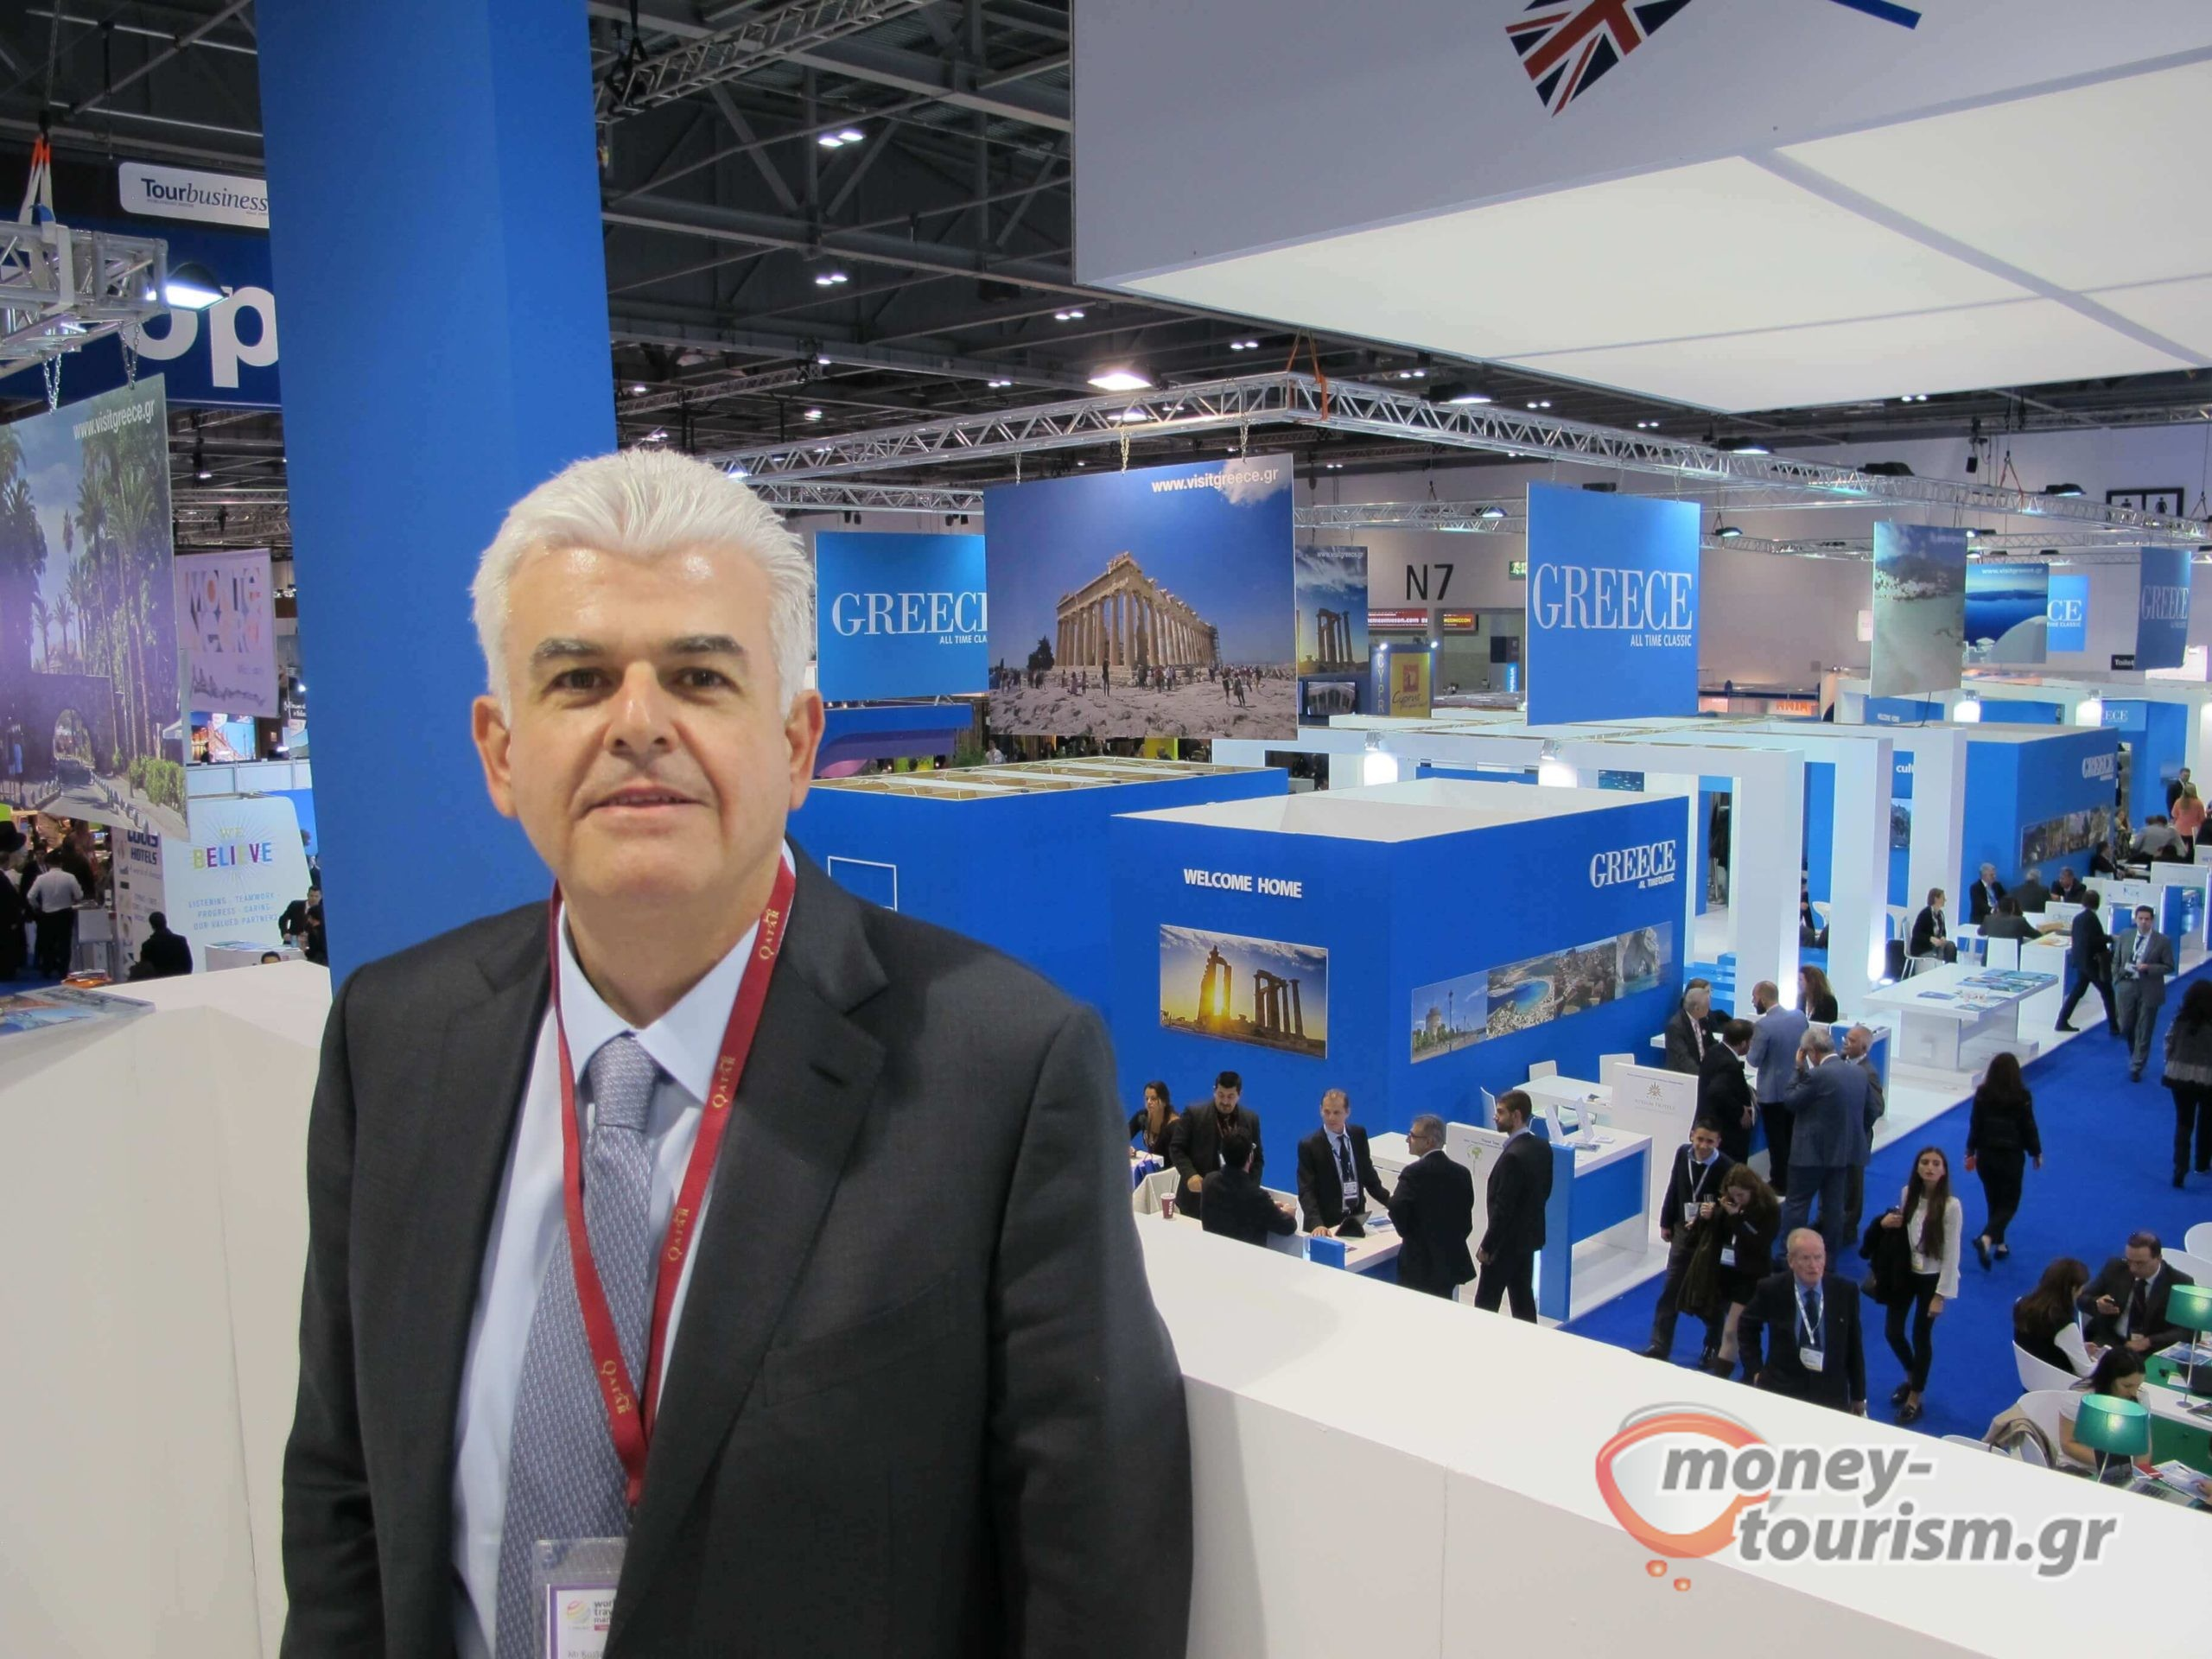 money tourism photo ΠΟΞ